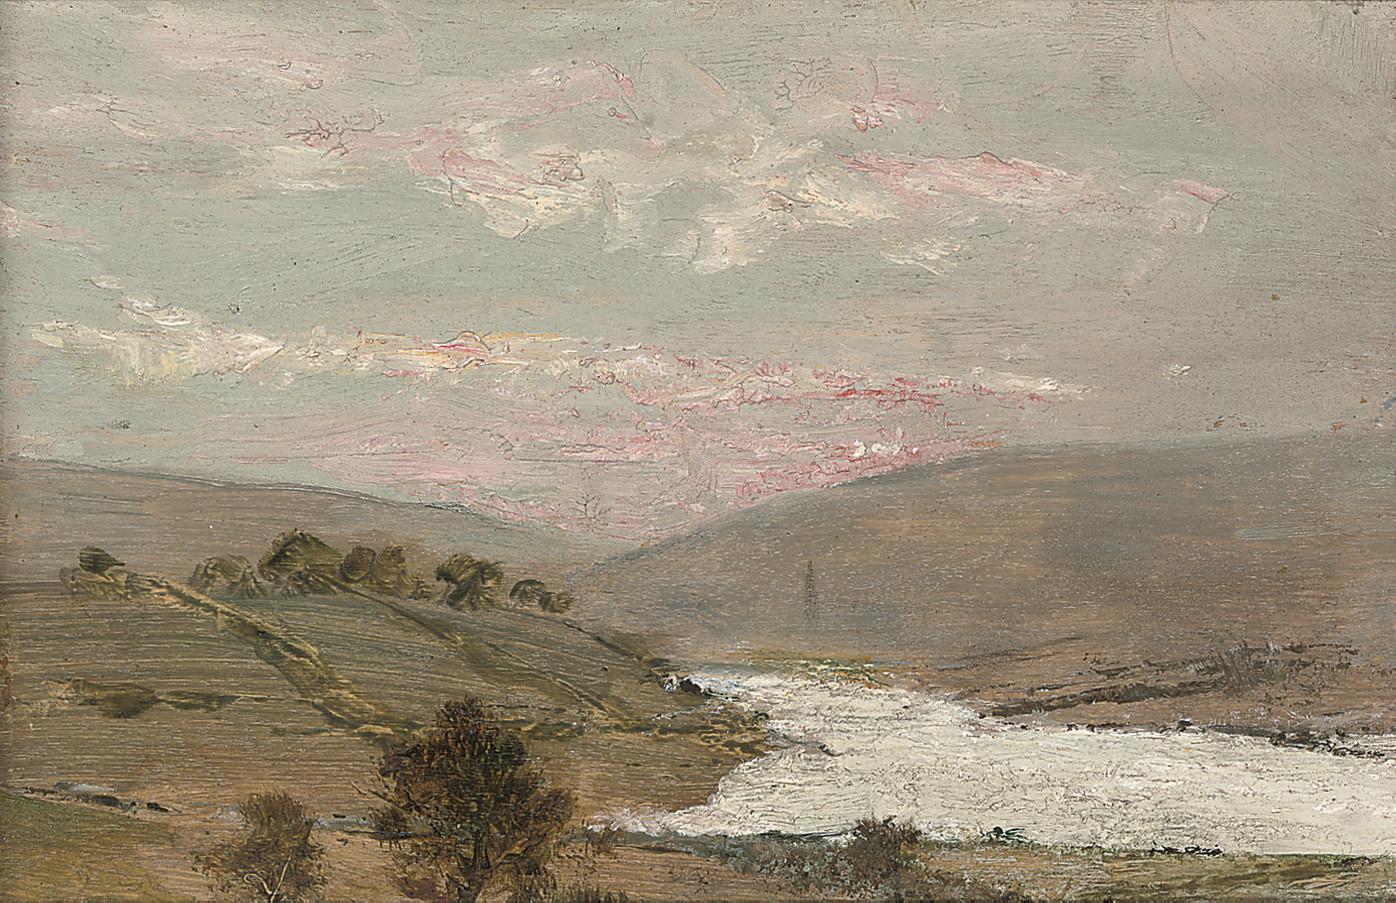 Autumn towards Letterkenny from Manor Cunningham